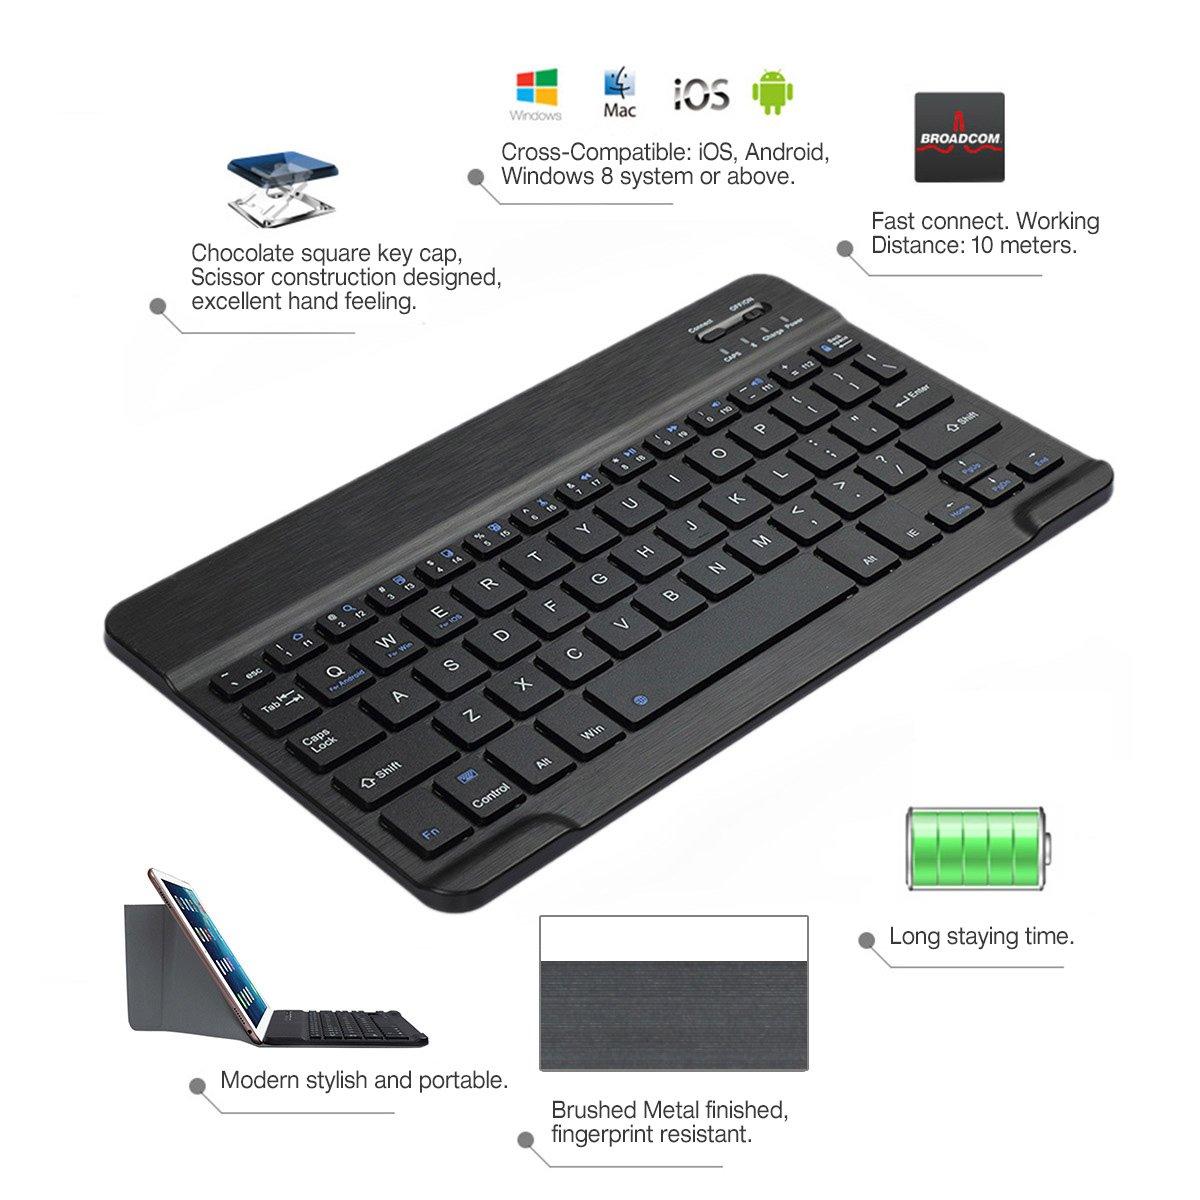 CoastaCloud 7-inch Ultra Slim Portable Wireless Bluetooth Keyboard for iPad 2/3/4, iPad Mini 4/3/2/1, Galaxy Tab and other iOS, Android, Windows Devices (Black) by CoastaCloud (Image #3)